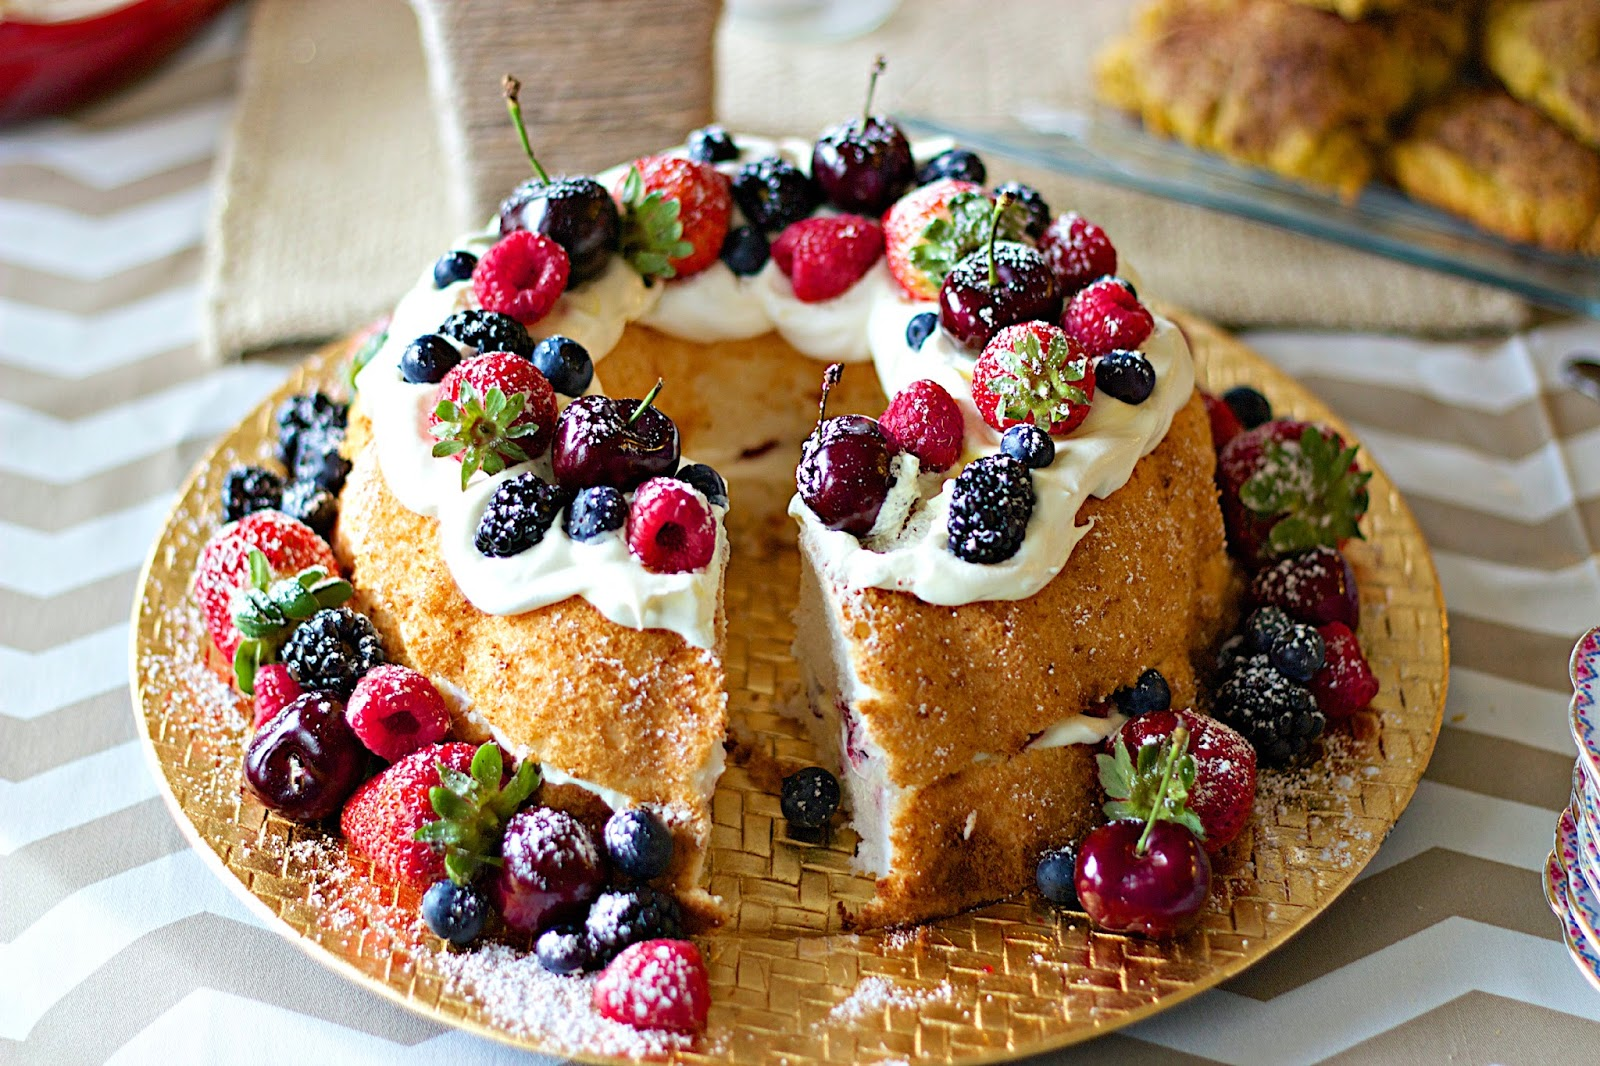 EnJOIAble Desserts Etc.: Pretty Berry Birthday Angel Food Cake1600 x 1066 jpeg 435kB